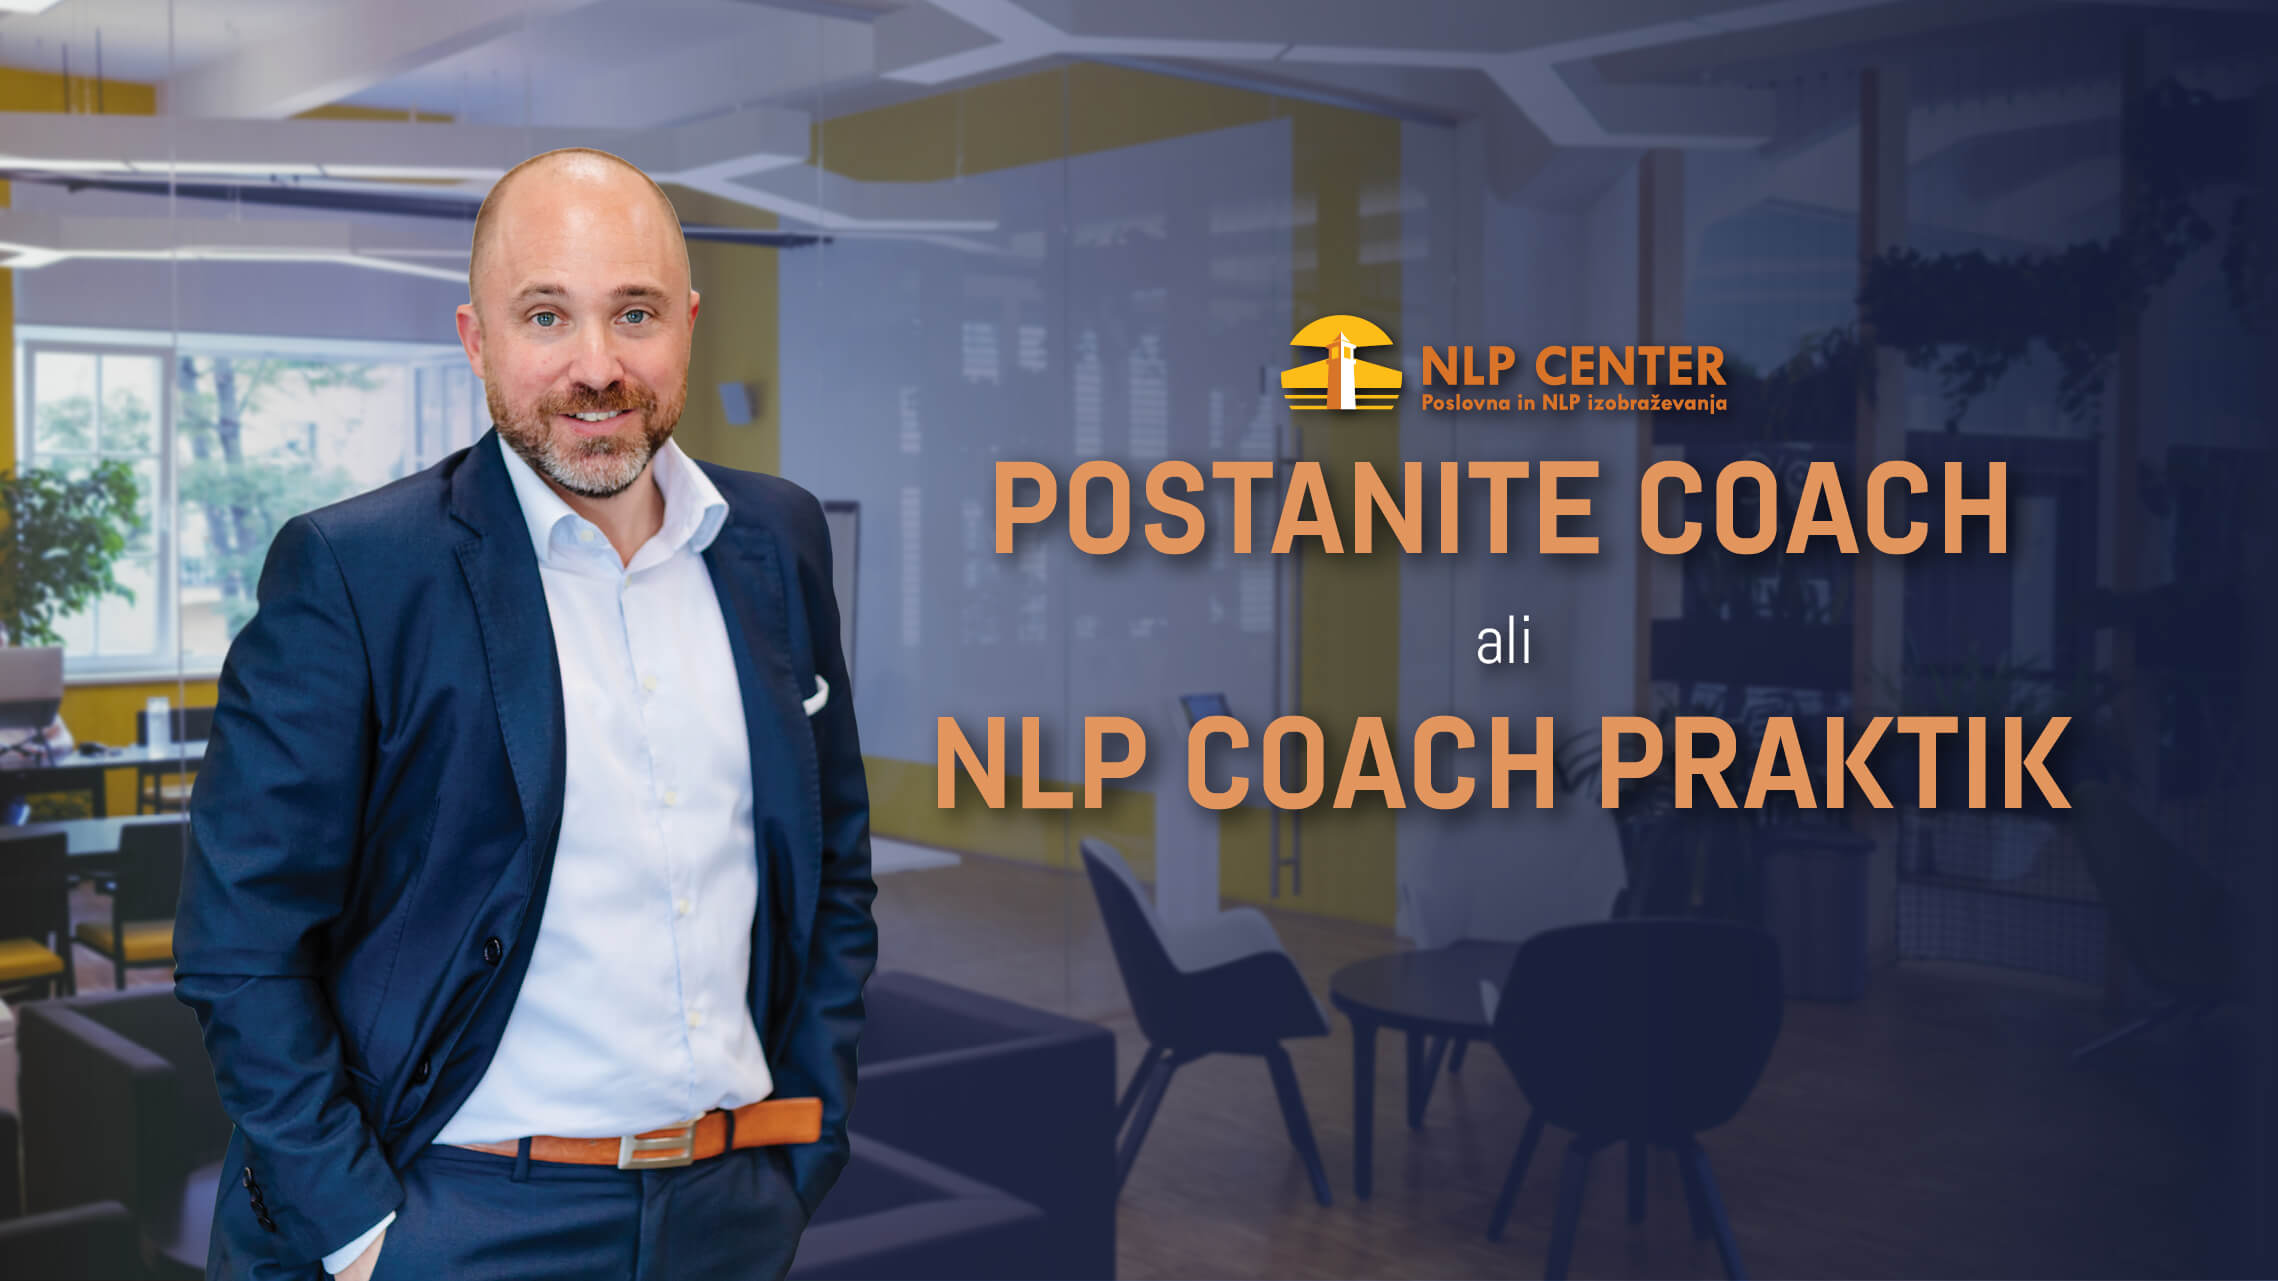 Postanite NLP coach